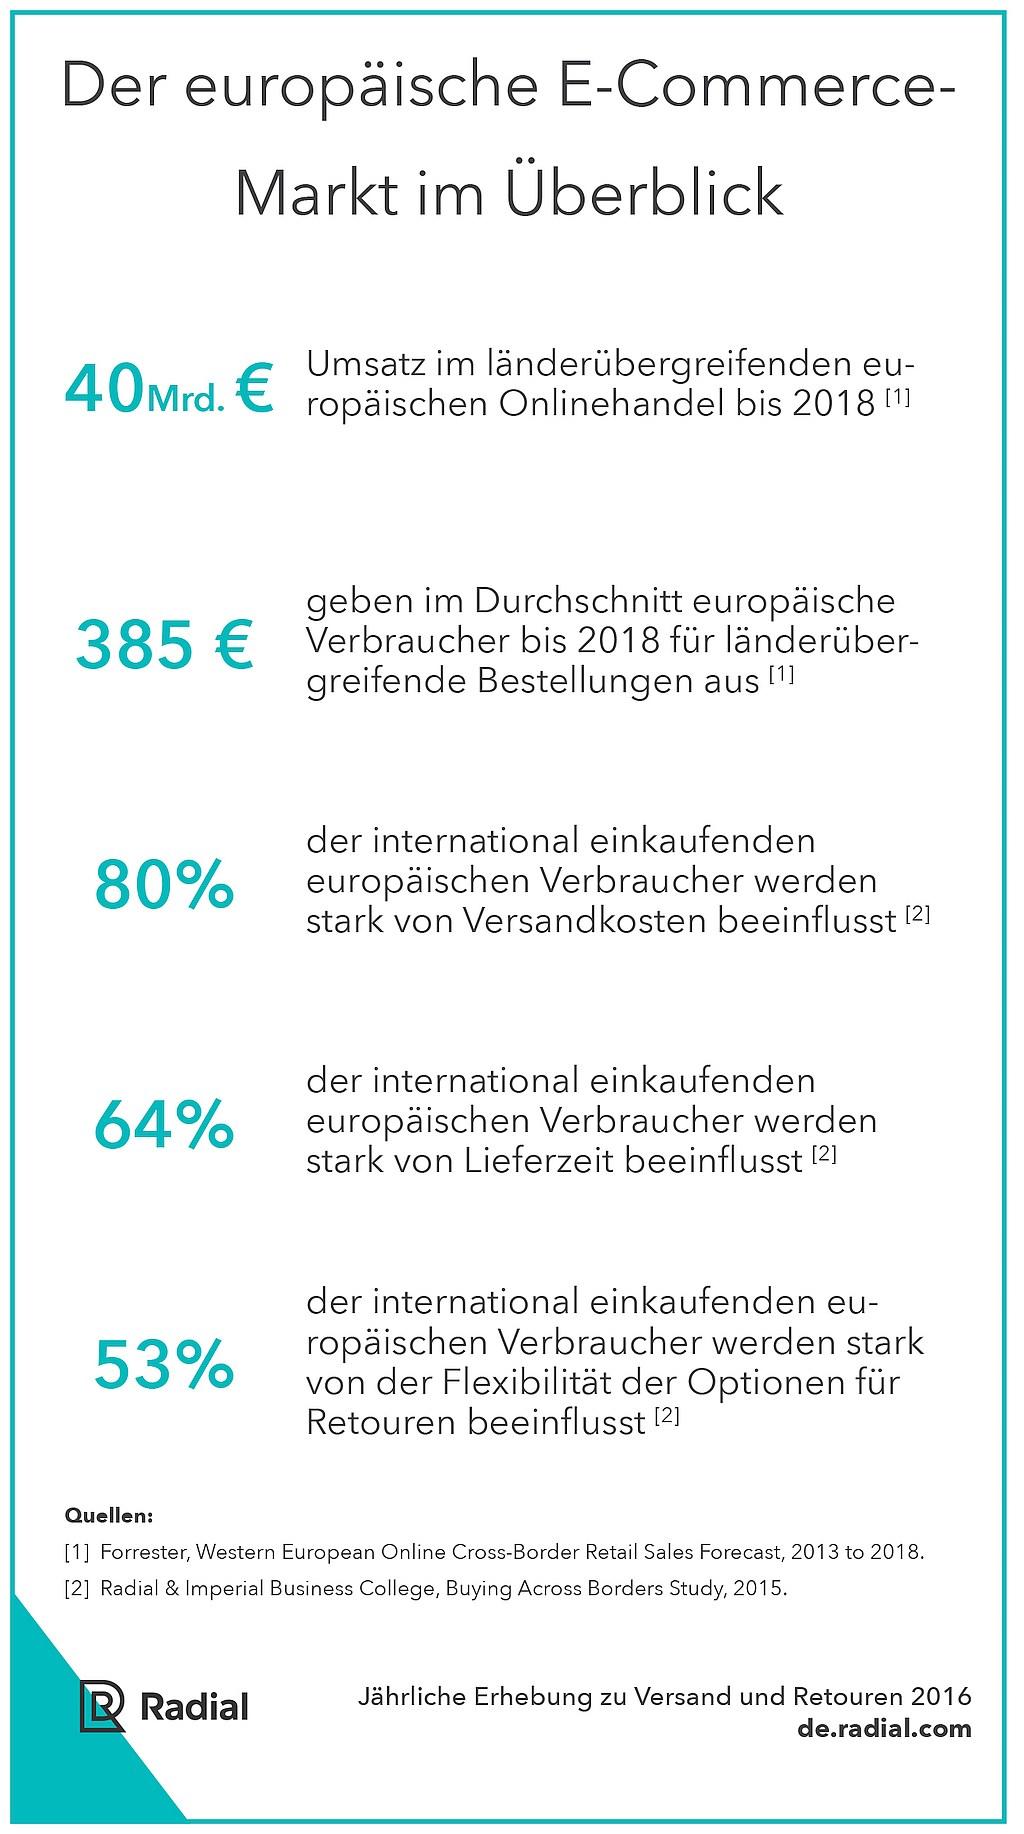 grafik-radial-e-commerce-markt-eu